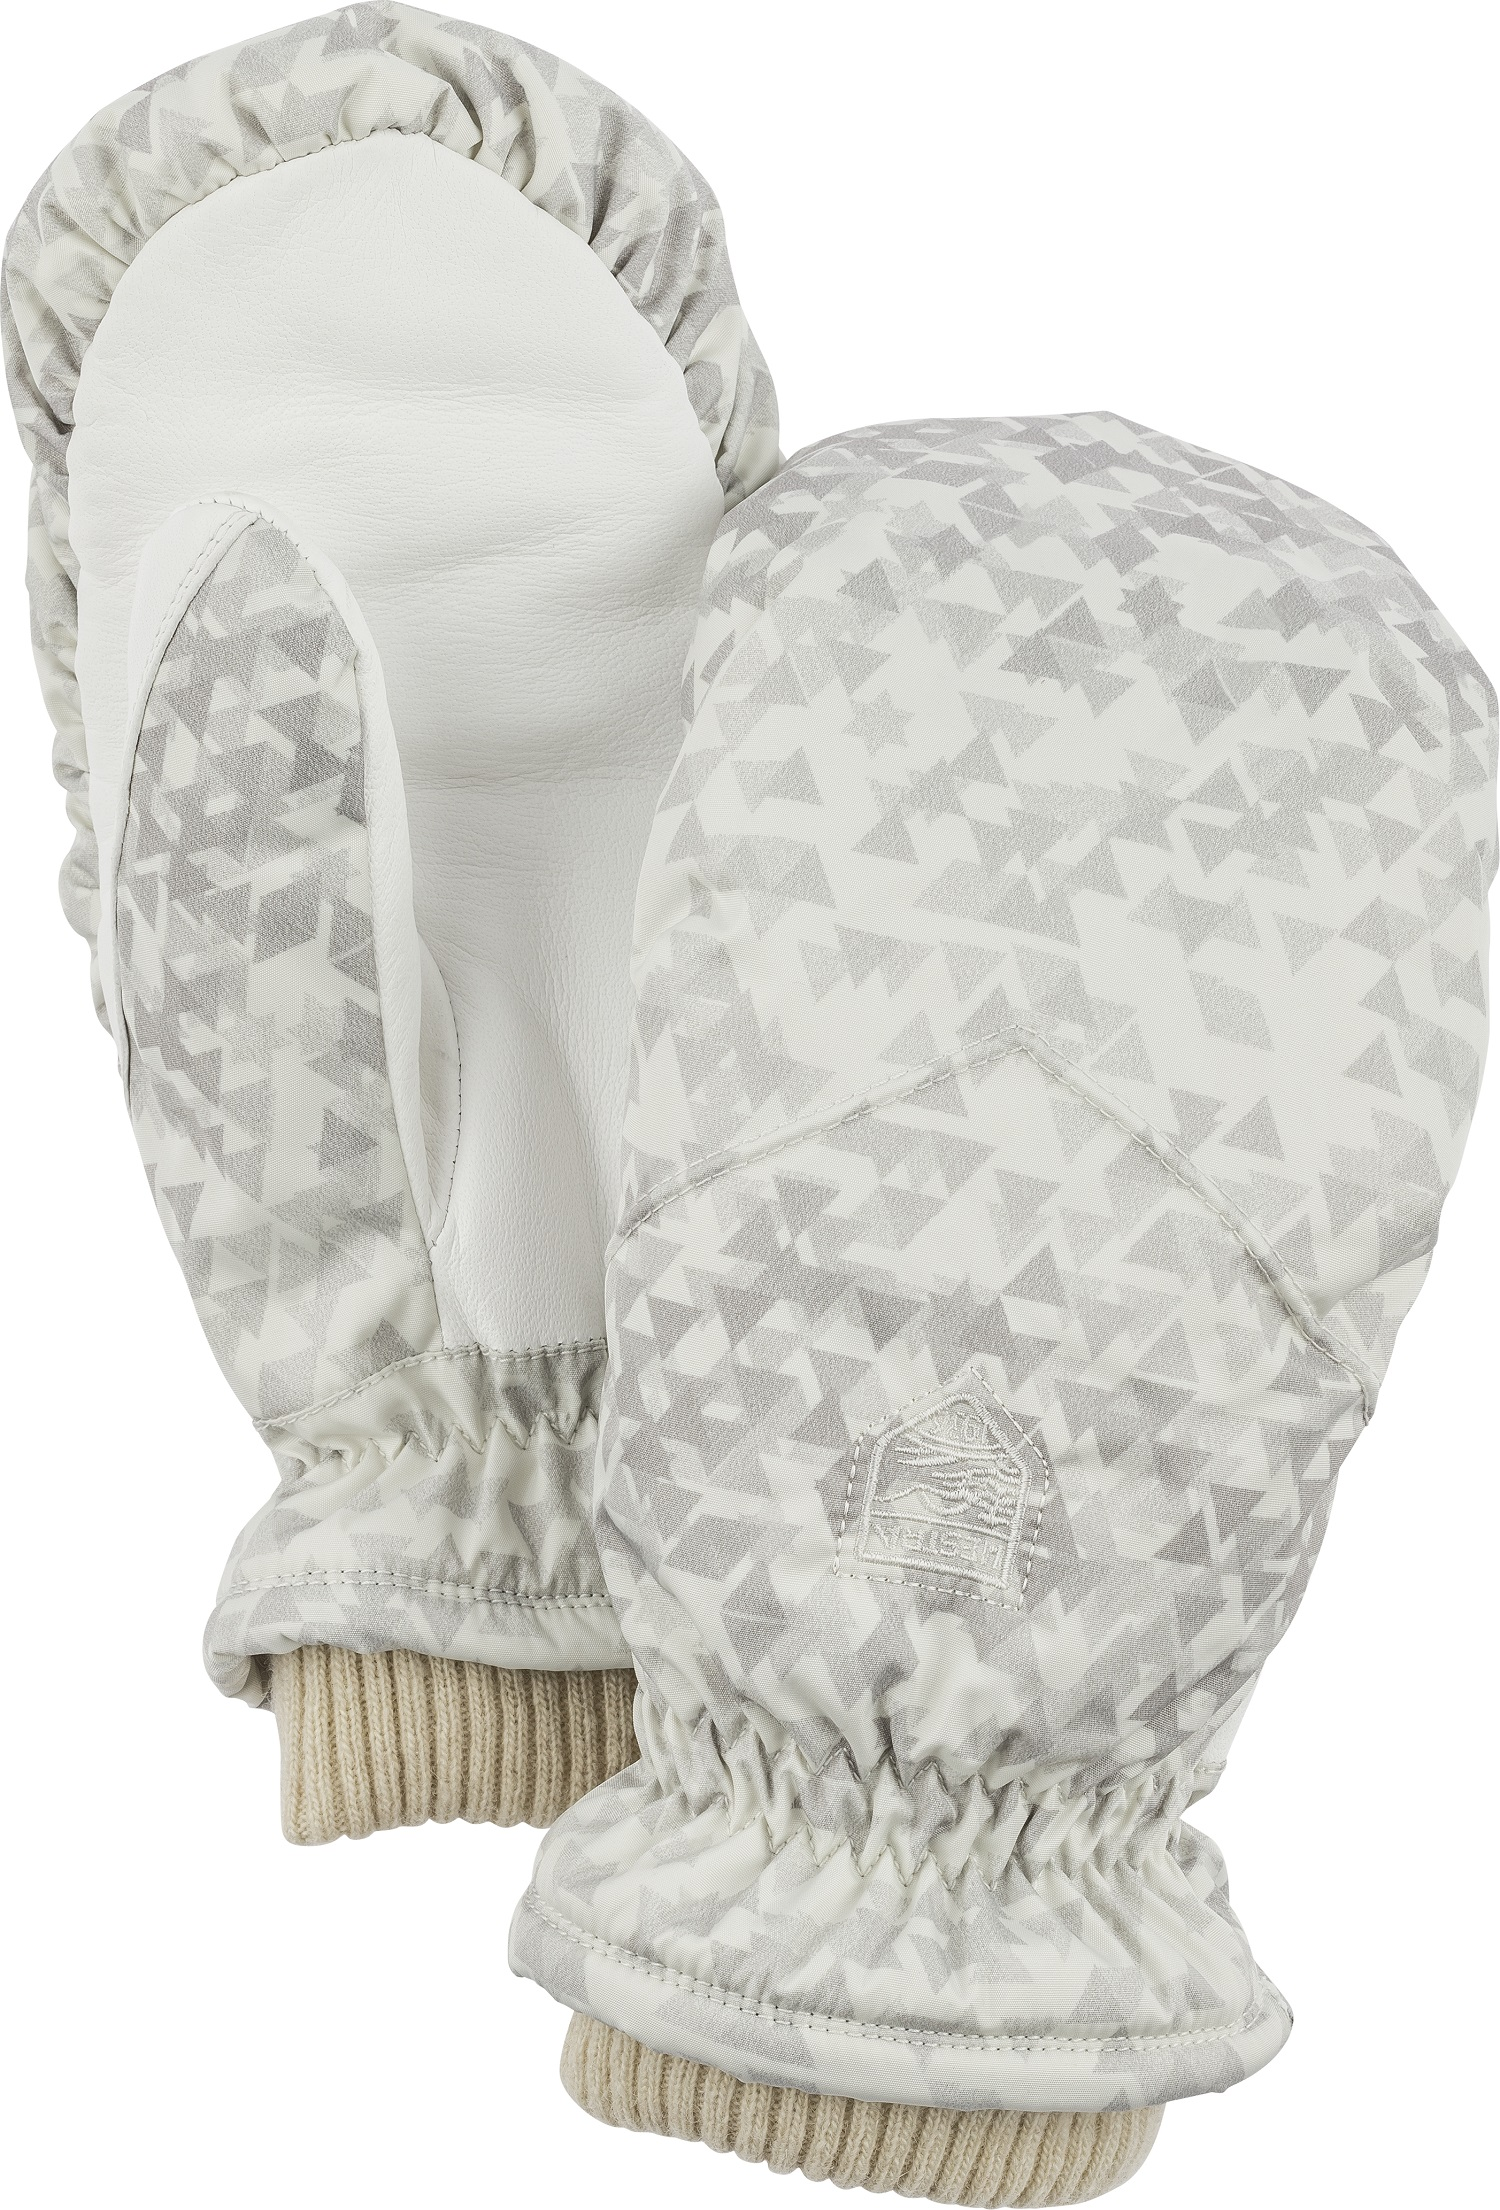 SALE EVENT Hestra Womens CZone Powder Gloves Light Grey Off White